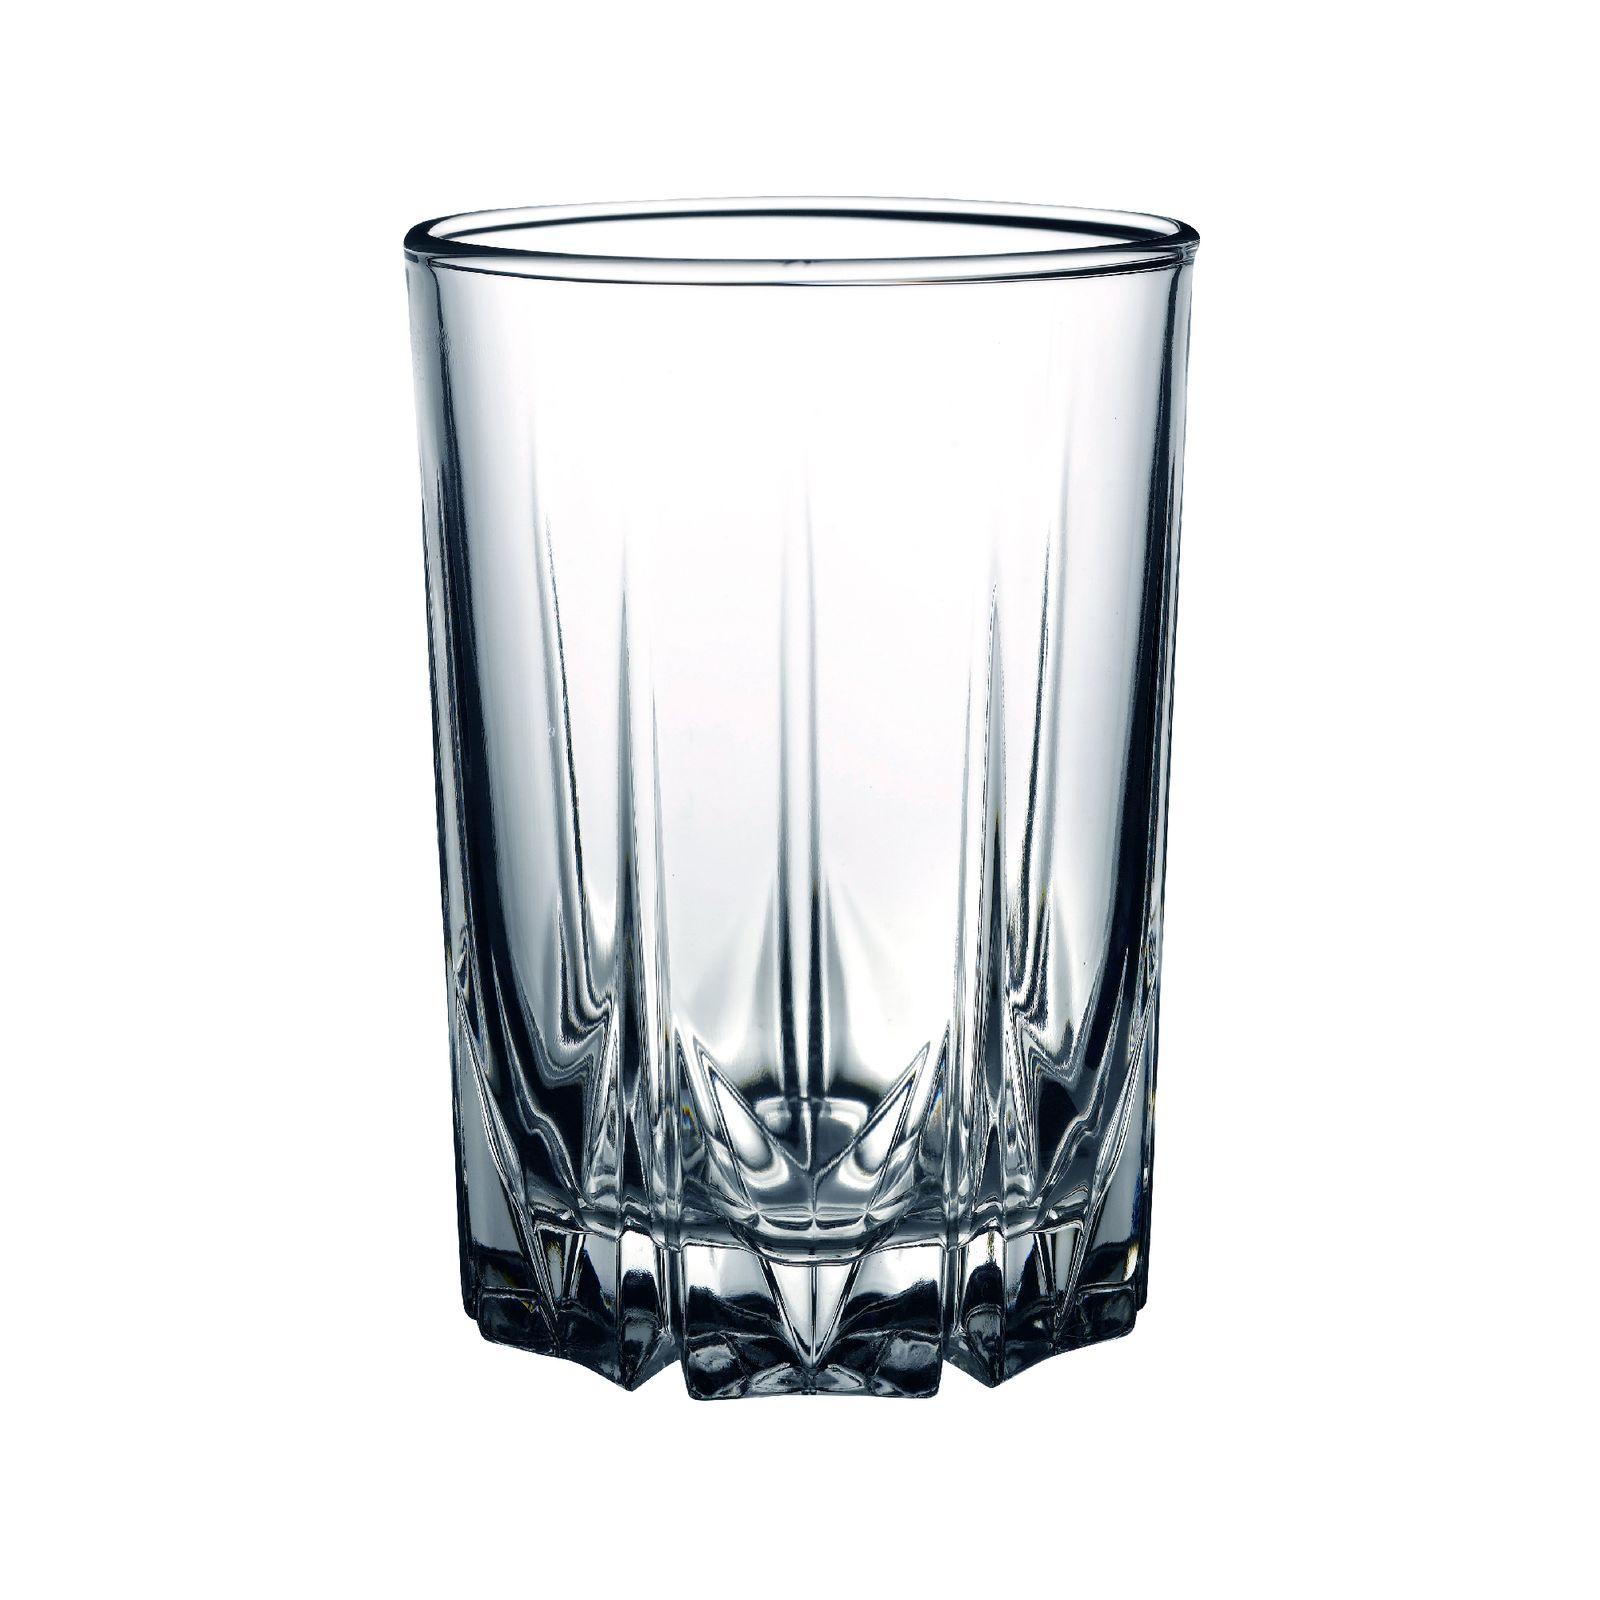 Set of 6 glasses Karat 250 ml PASABAHCE